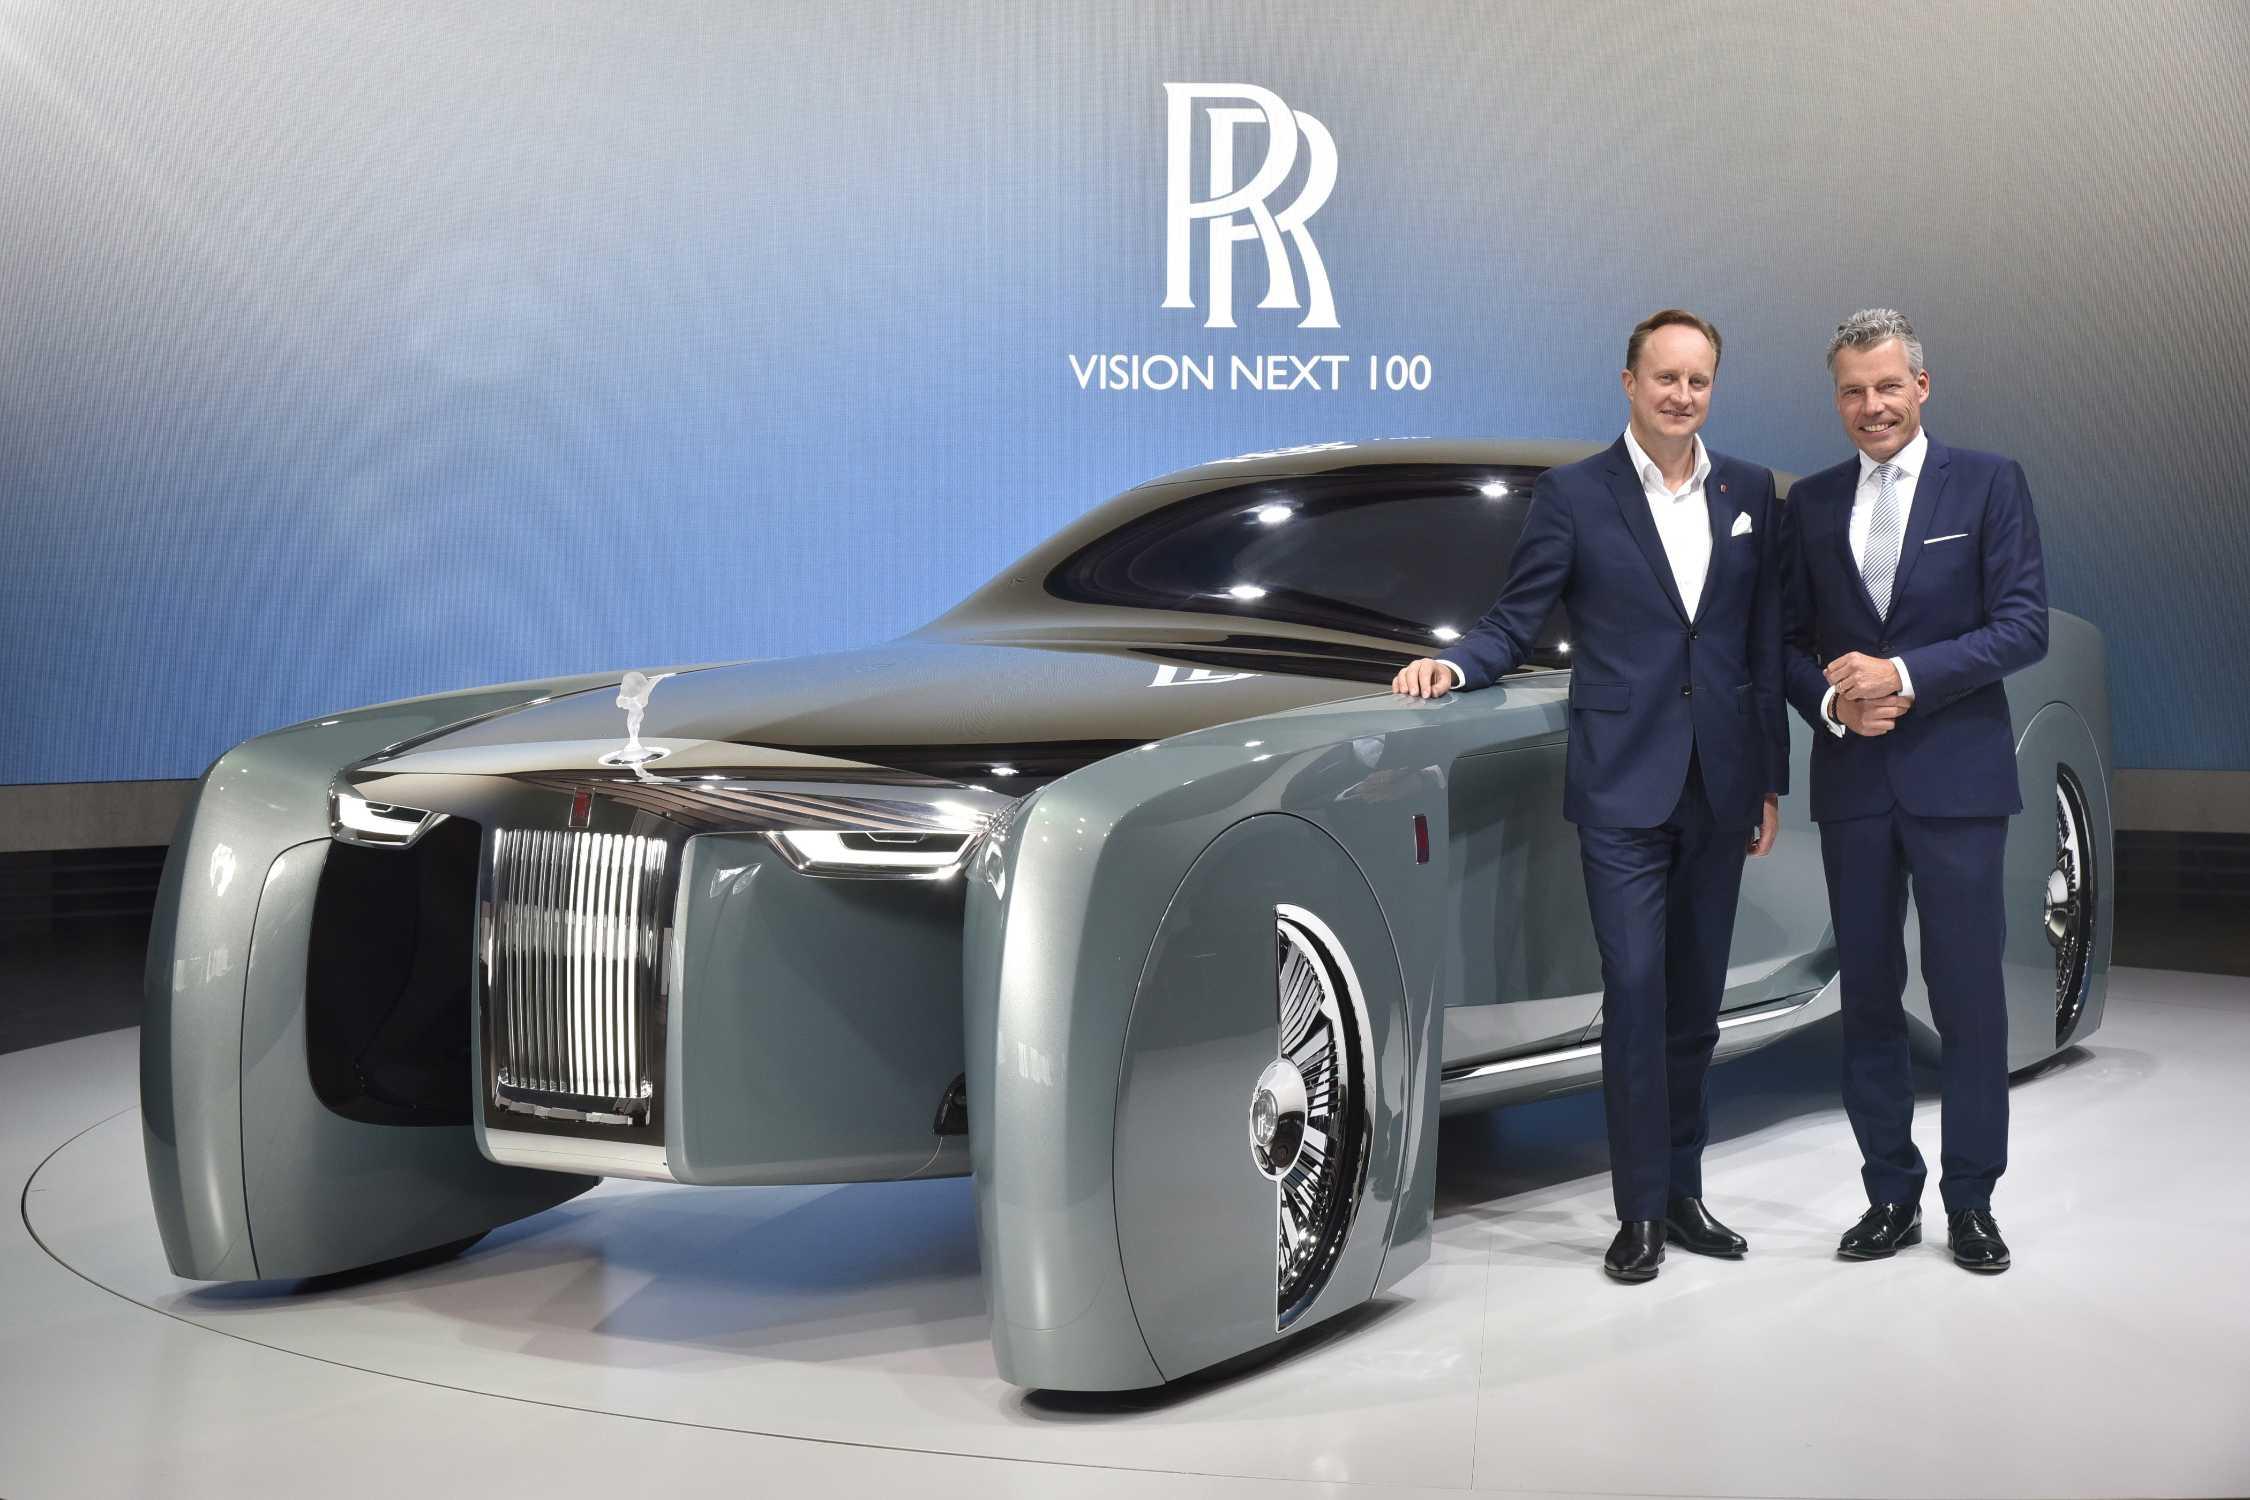 P90223404 Rolls Royce Vision Next 100 L R Torsten Mueller Oetvoes Ceo Of Motor Cars Giles Taylor 2250px Jpg